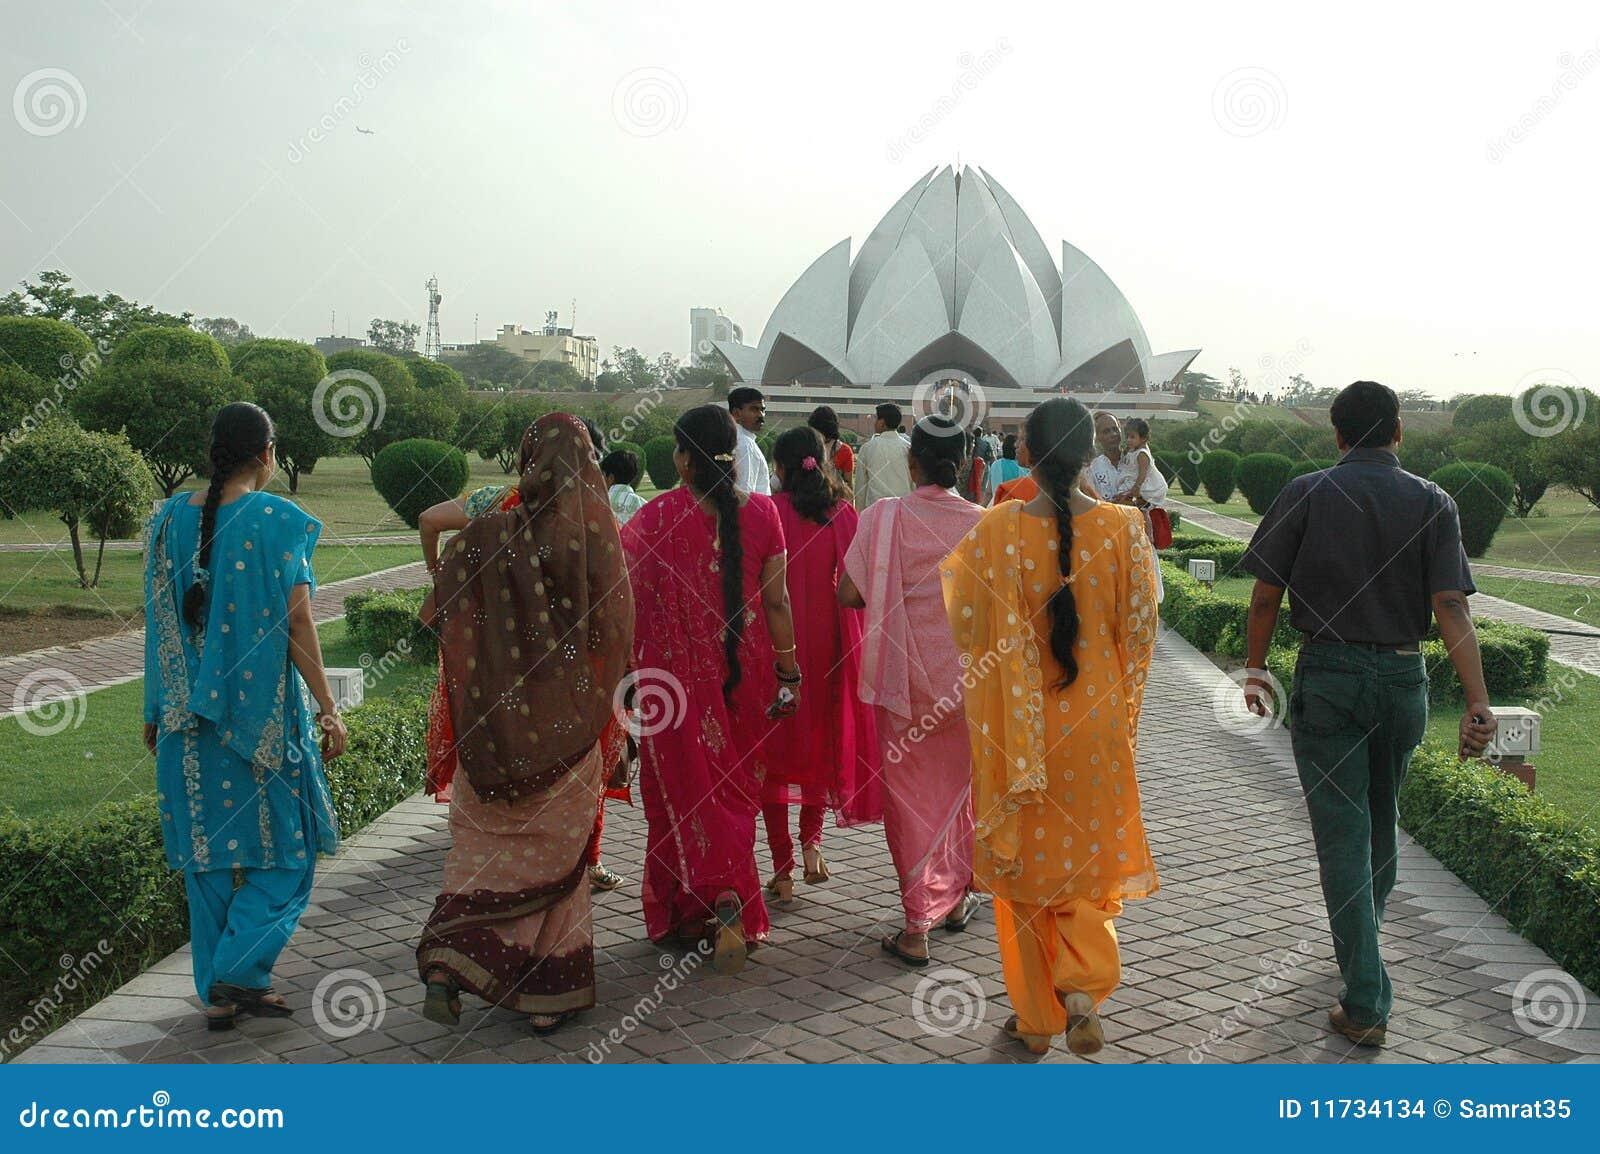 Lotus Temple In New Delhi India Editorial Stock Image